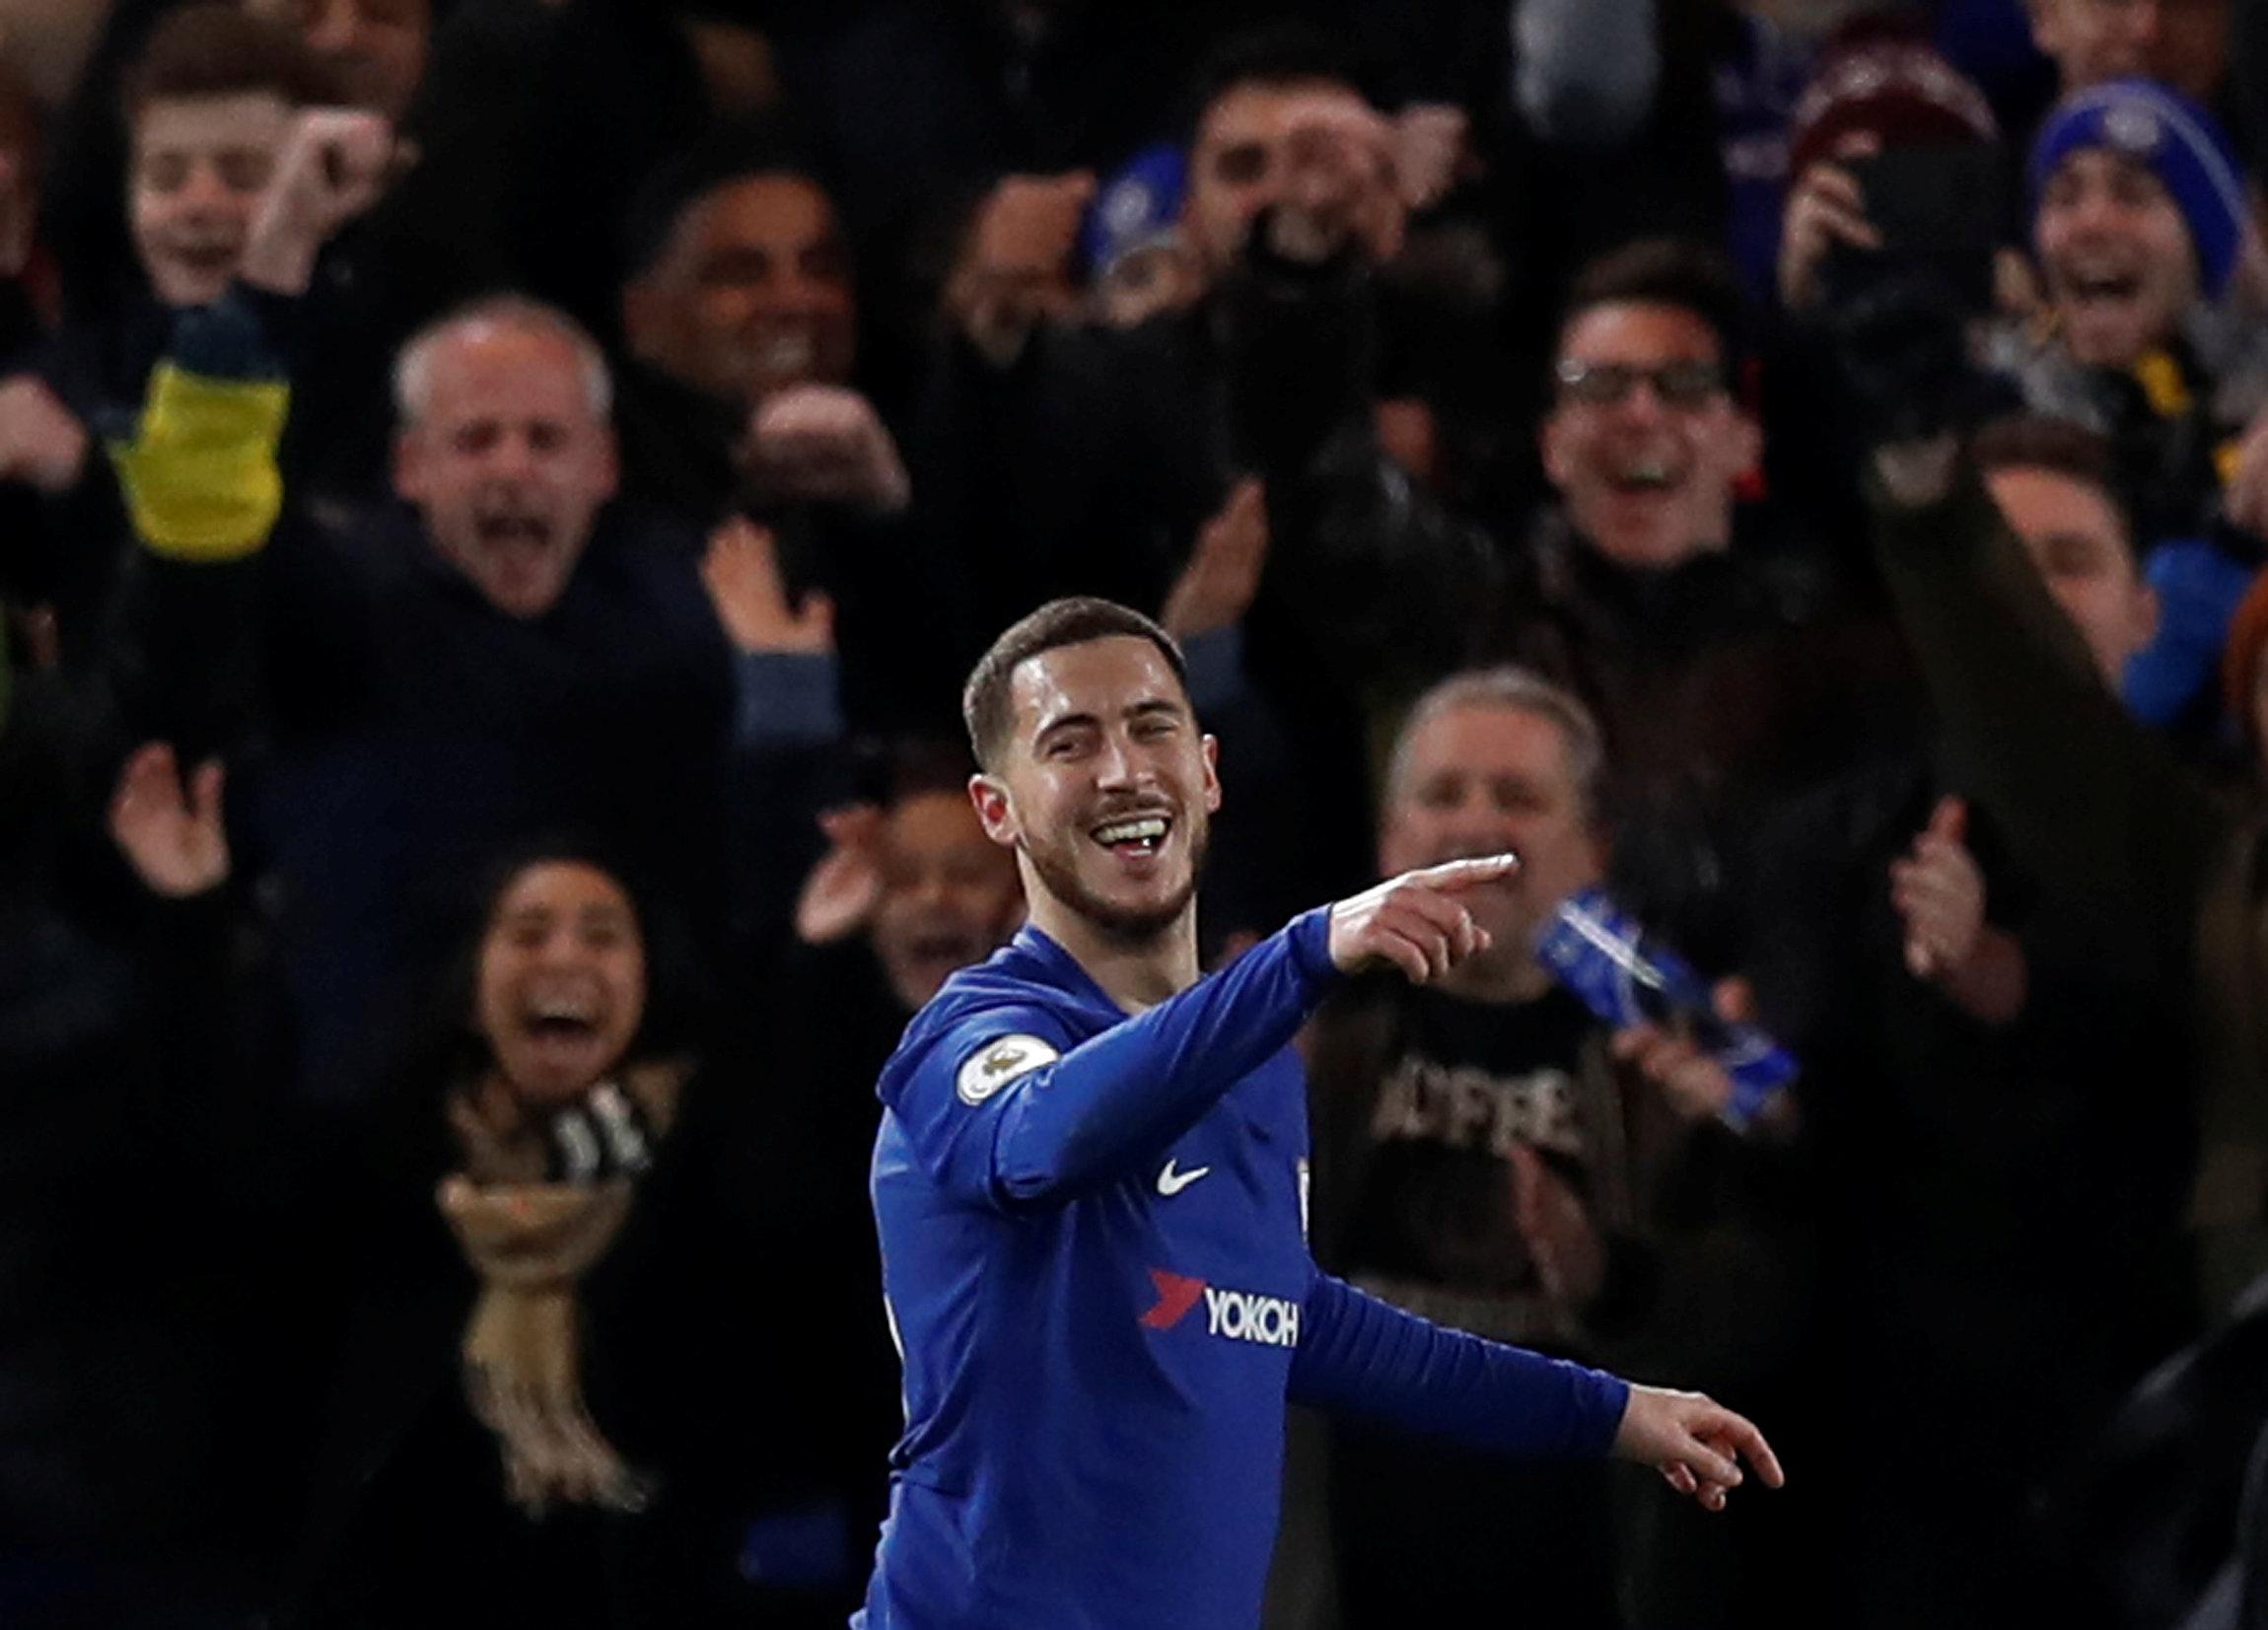 Niềm vui của Hazard sau khi mở tỉ số cho Chelsea. Ảnh: REUTERS